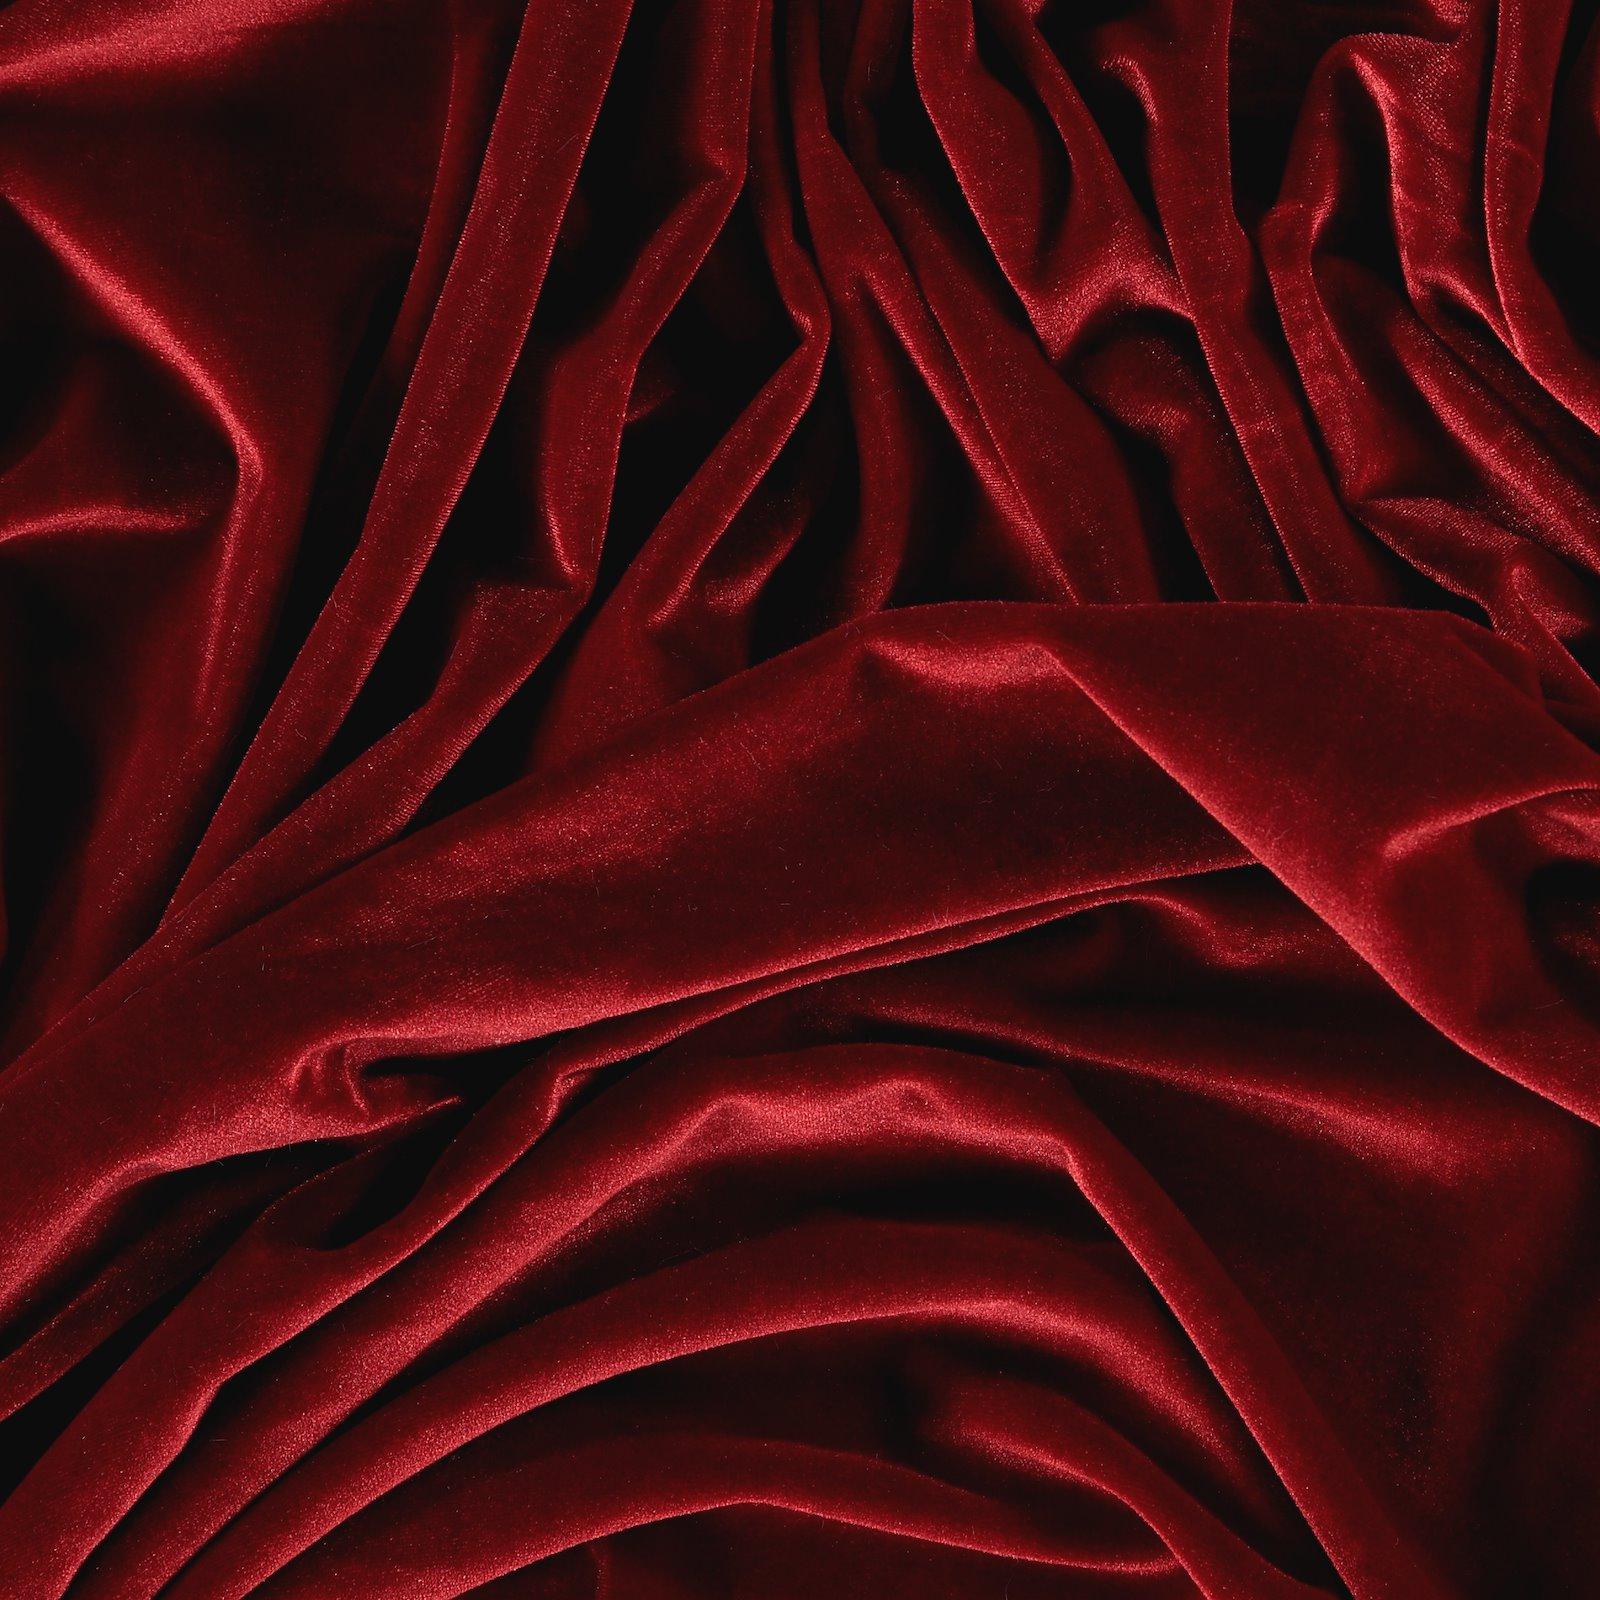 Shiny stretch velvet dark red 250690_pack